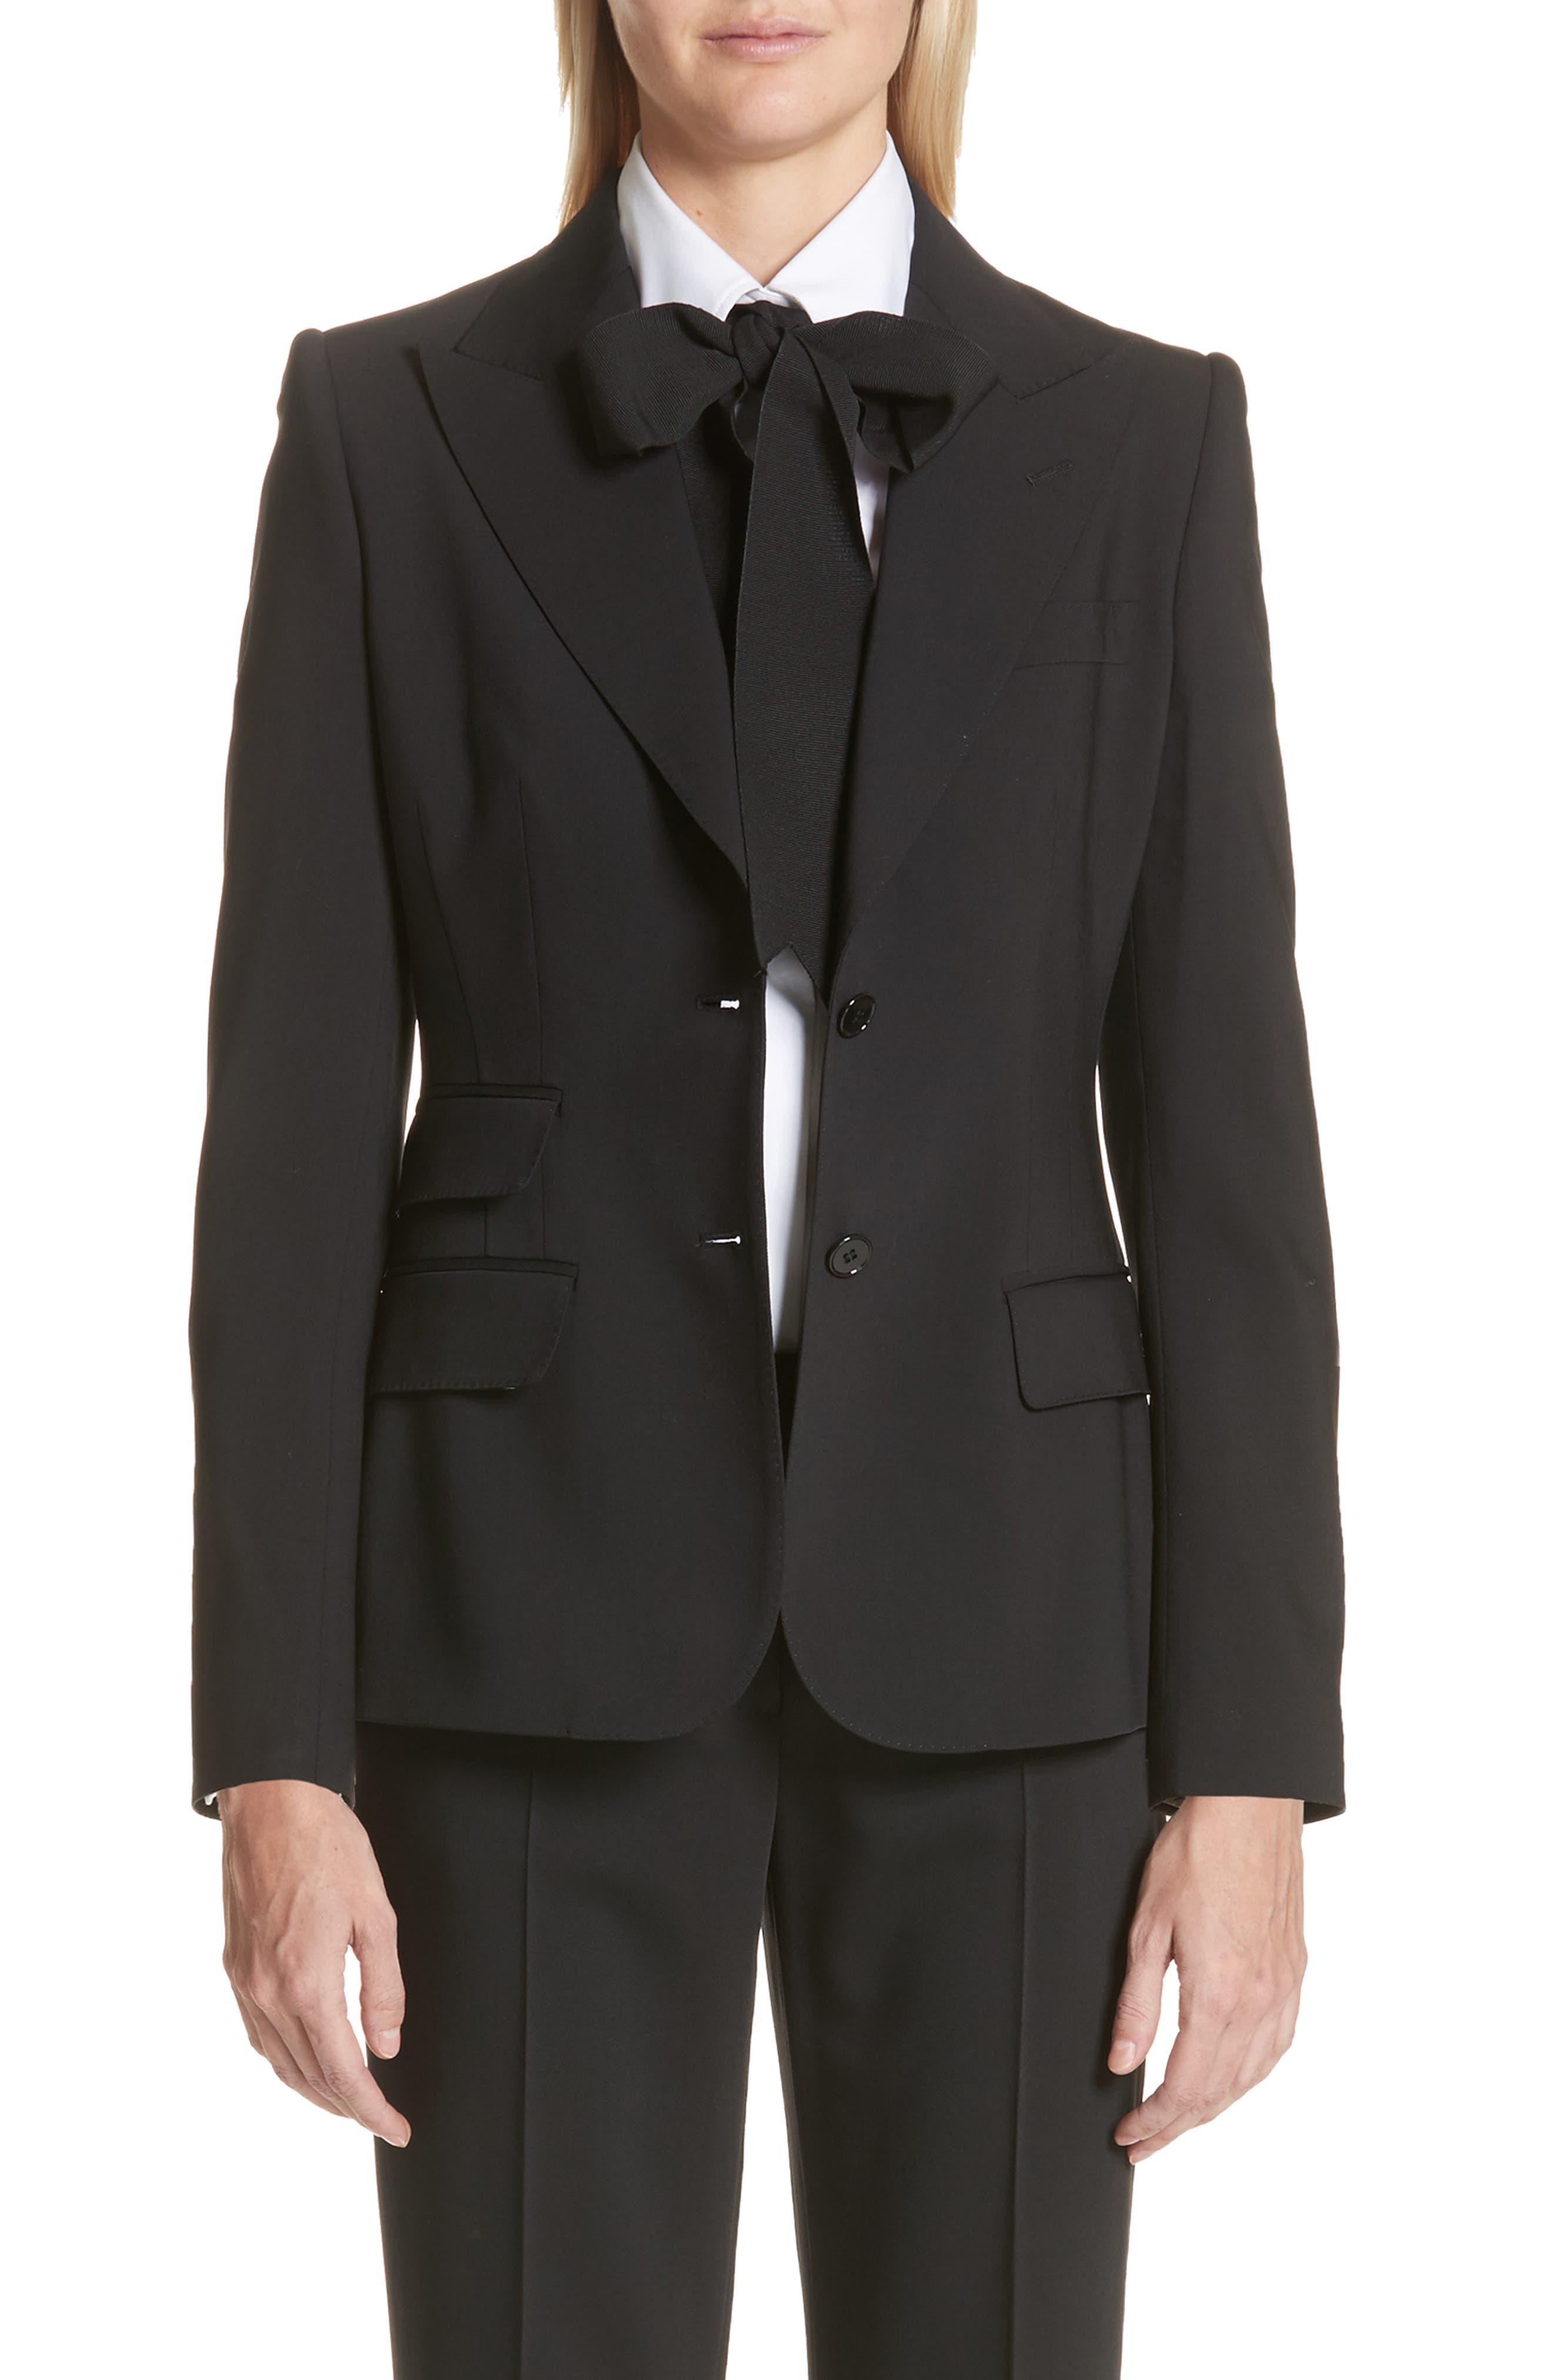 2cdcc0f437bcb6 Women's Dolce&Gabbana Clothing | Nordstrom